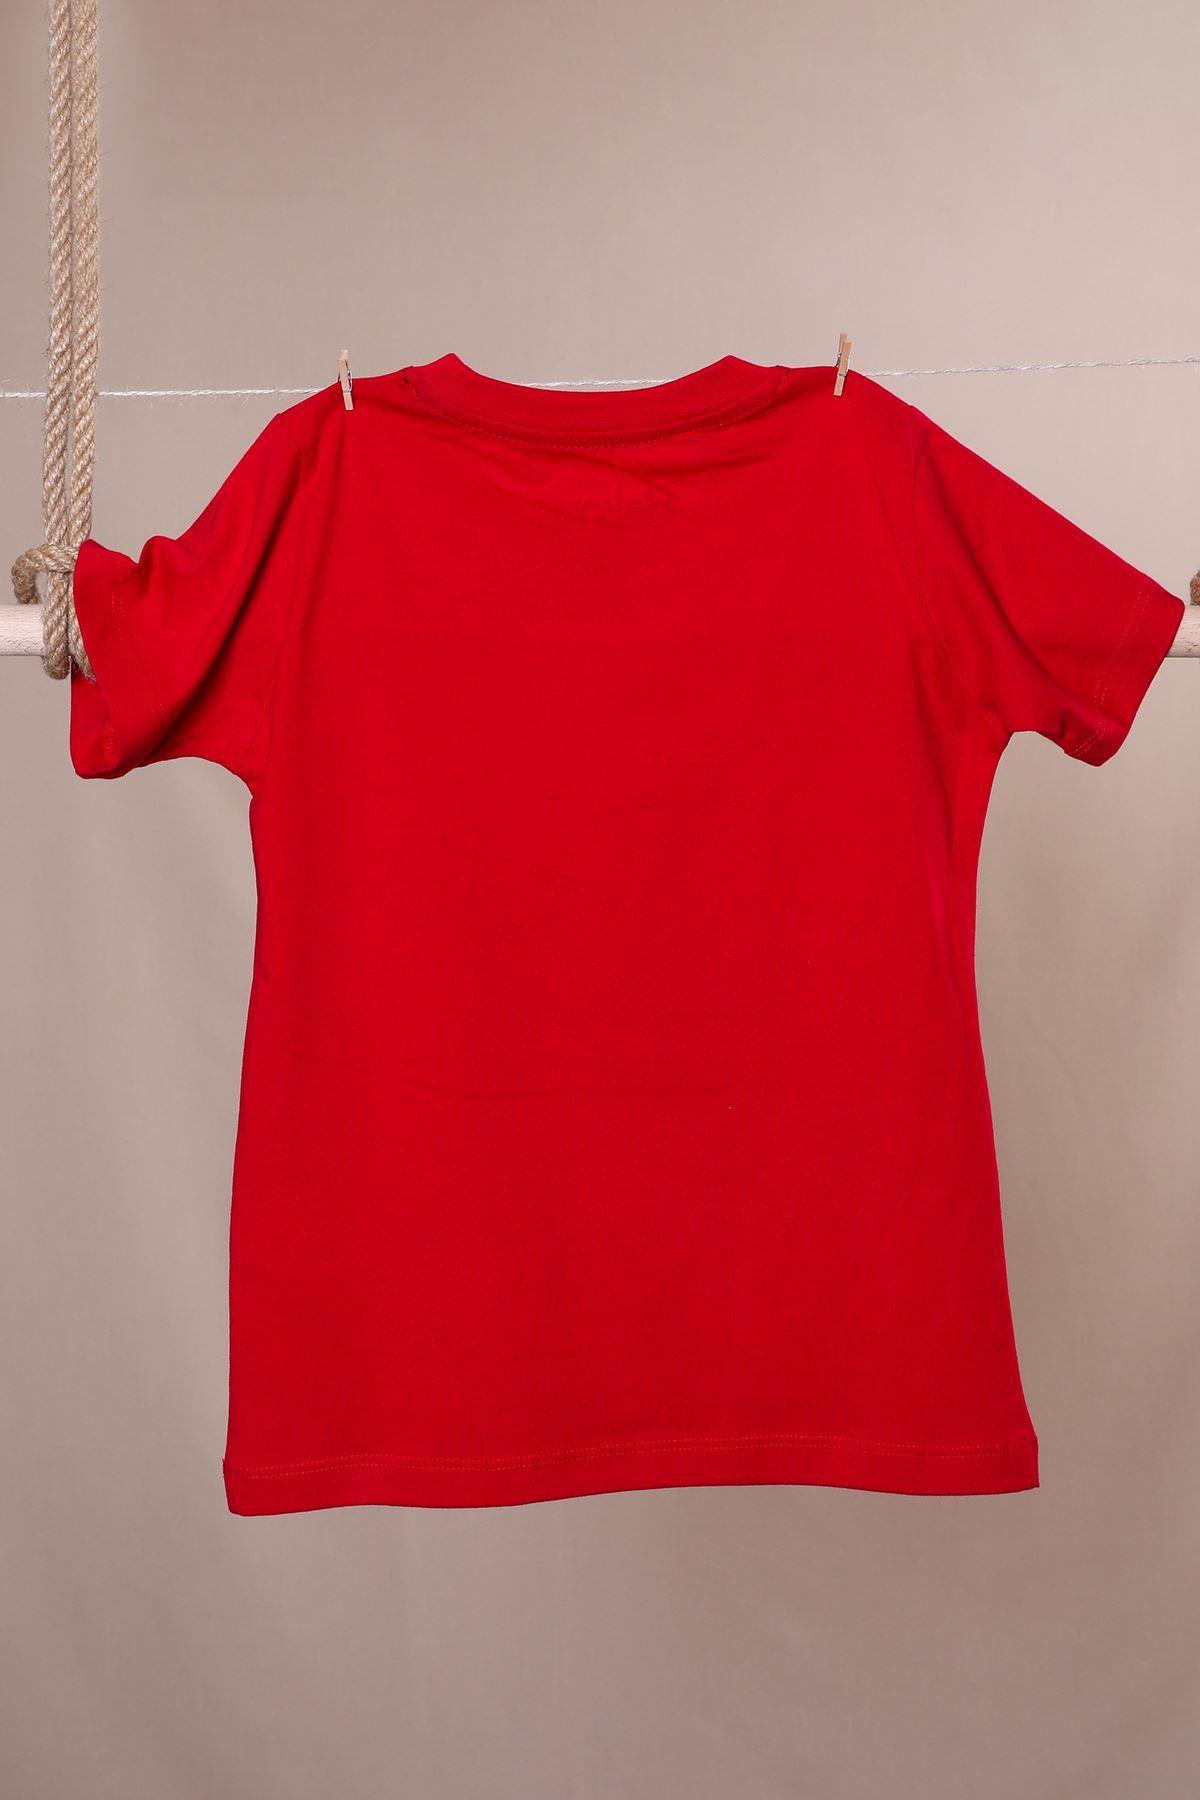 Dinazorlu Aksesuarlı T-shirt